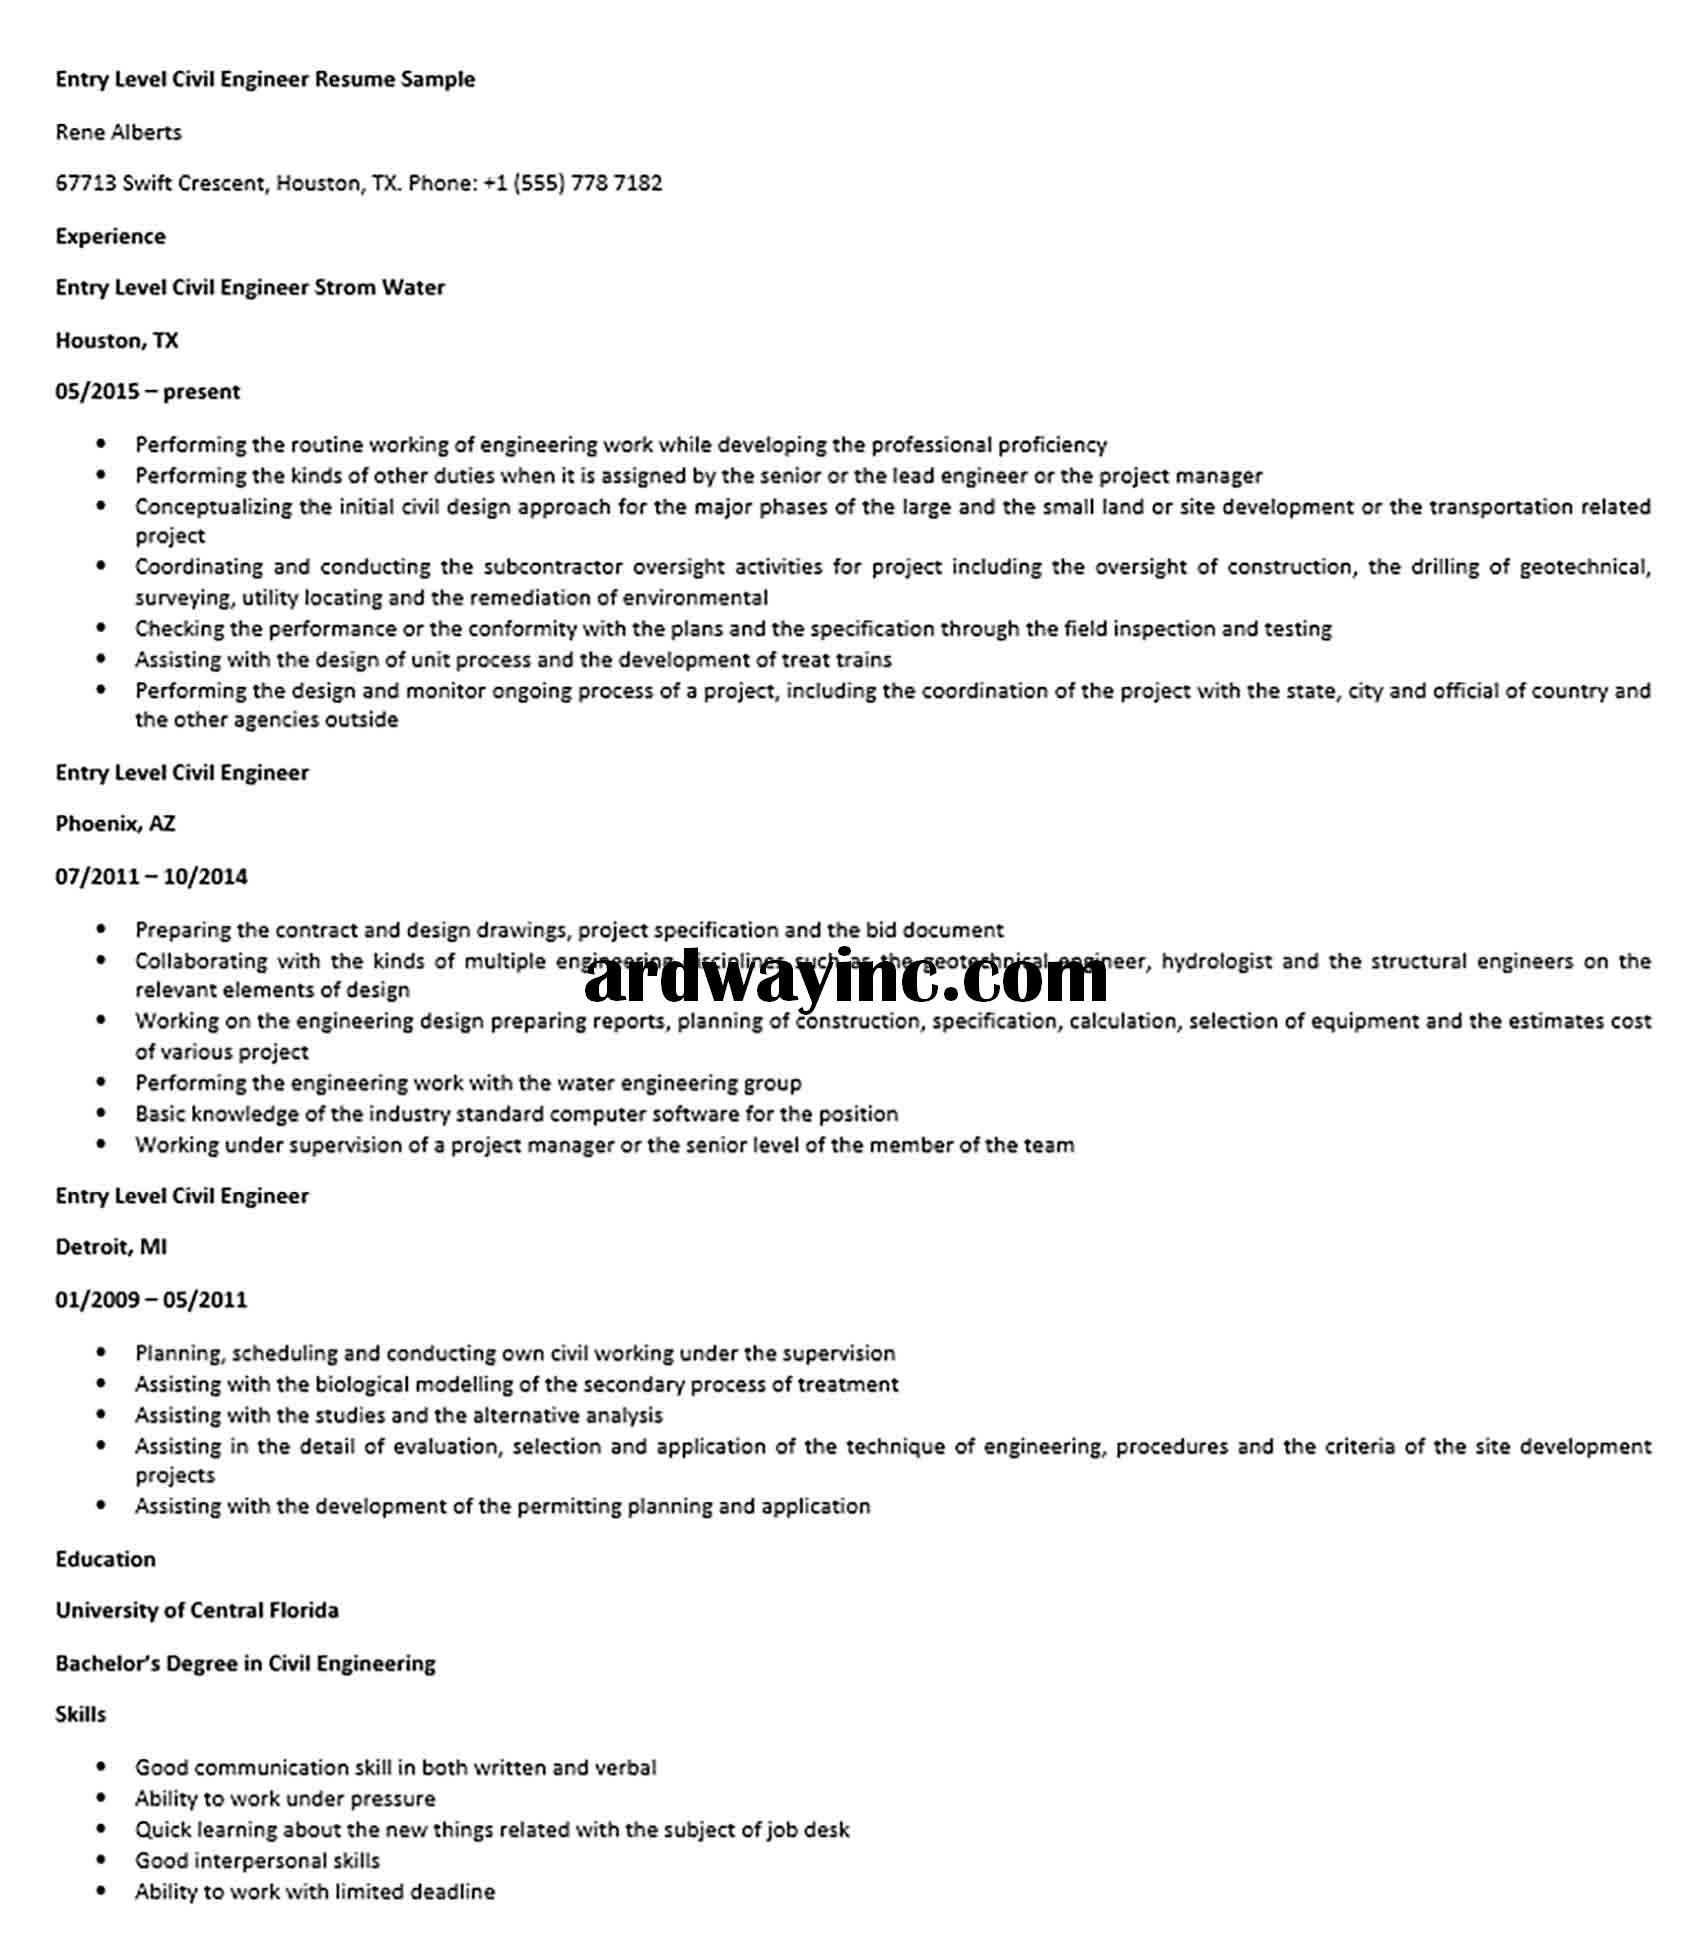 Entry Level Civil Engineer Resume Sample Civil Engineer Resume Civil Engineering Entry Level